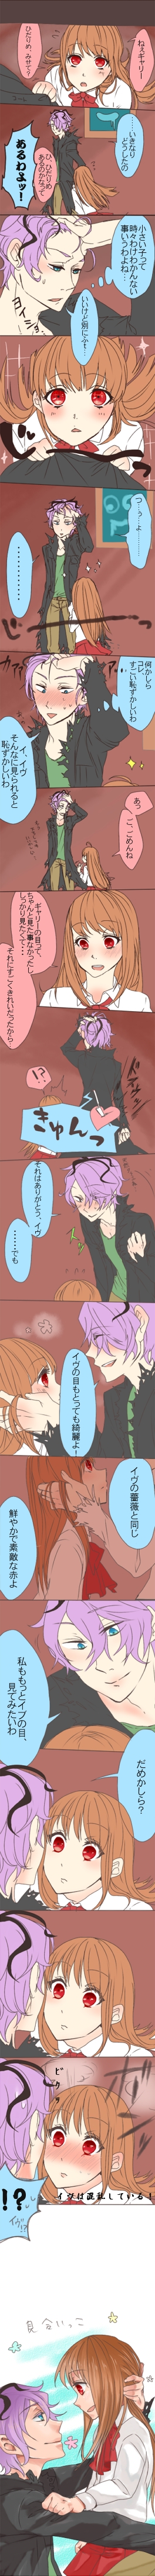 Tags: Anime, Pixiv Id 700810, Ib, Ib (Character), Garry, Pixiv, Comic, Translated